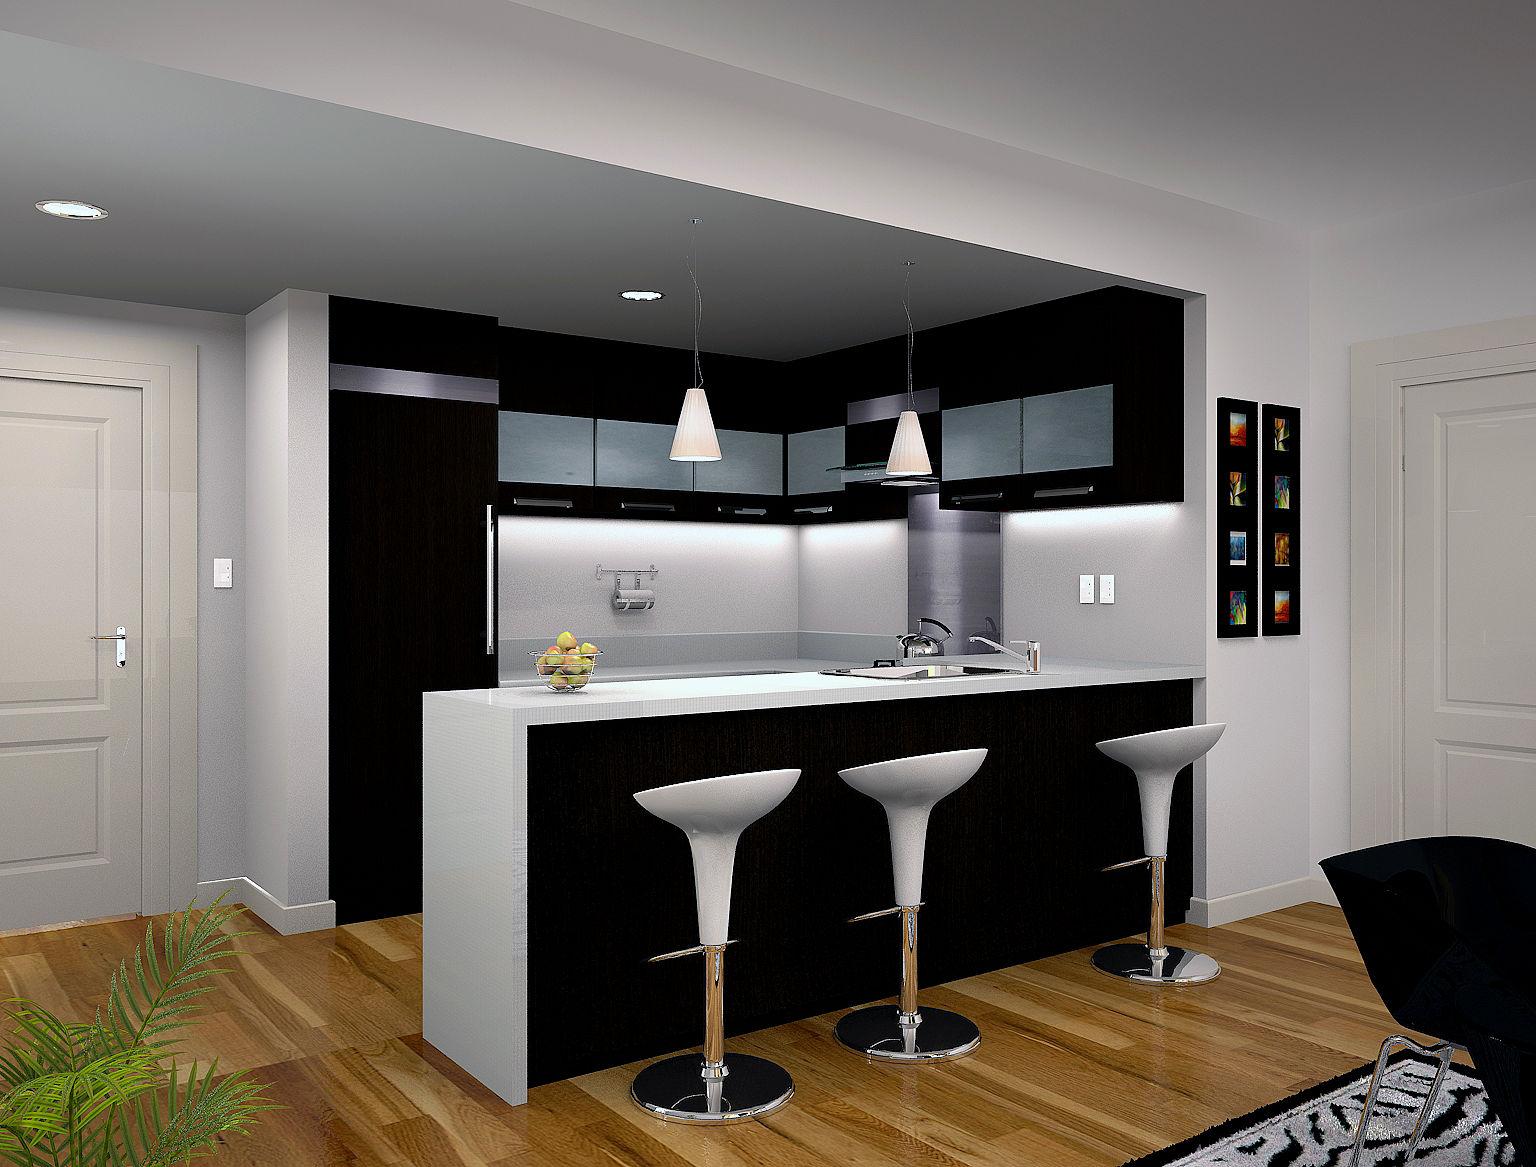 amazing home depot bathroom remodel ideas-Lovely Home Depot Bathroom Remodel Decoration